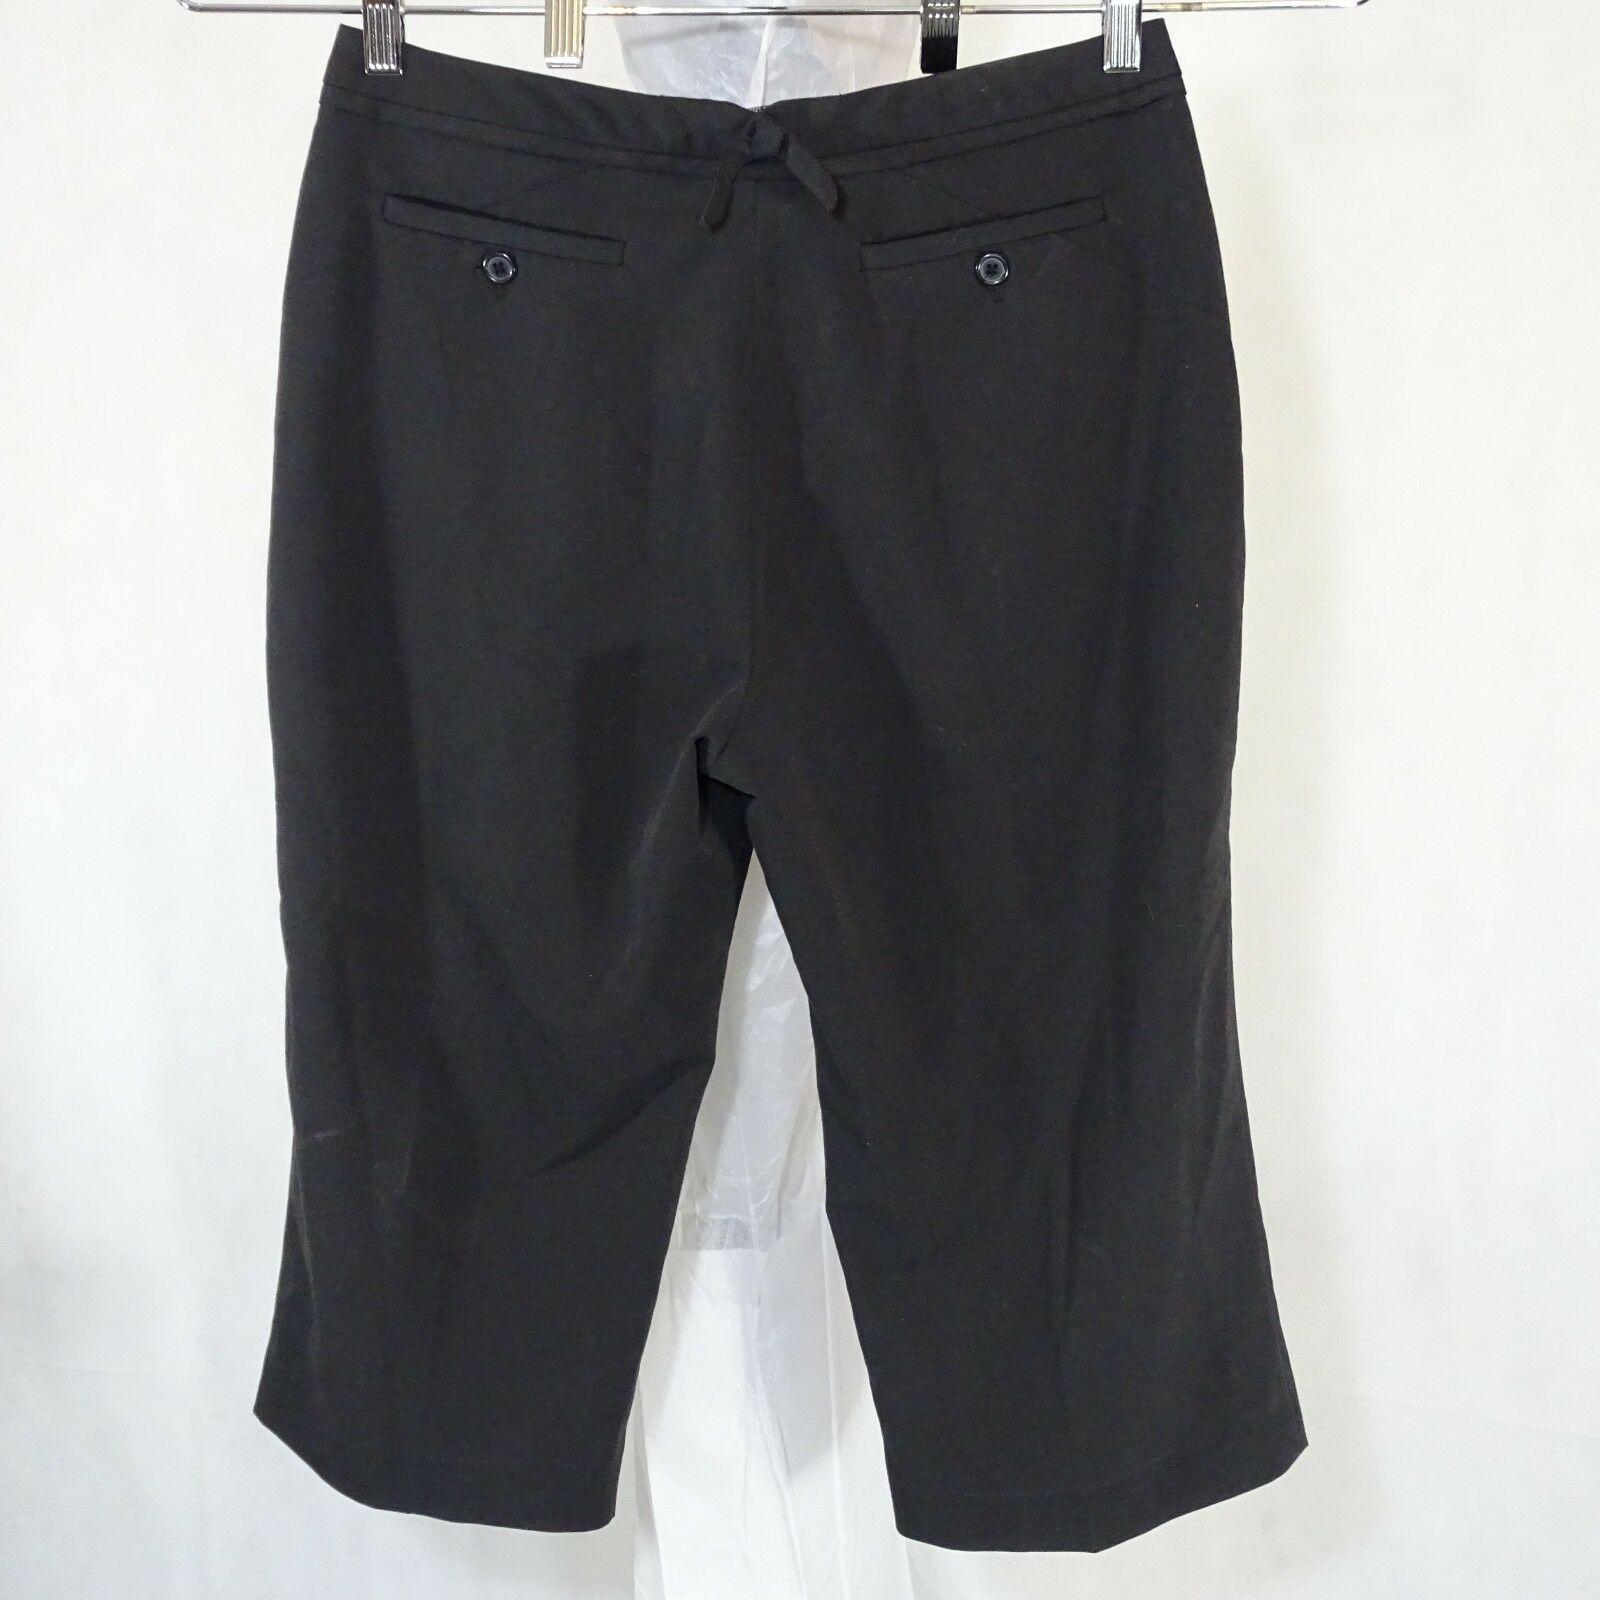 Larry Levine Capri Pants Women Size 8 Black Career Work Wear Casual Stretch